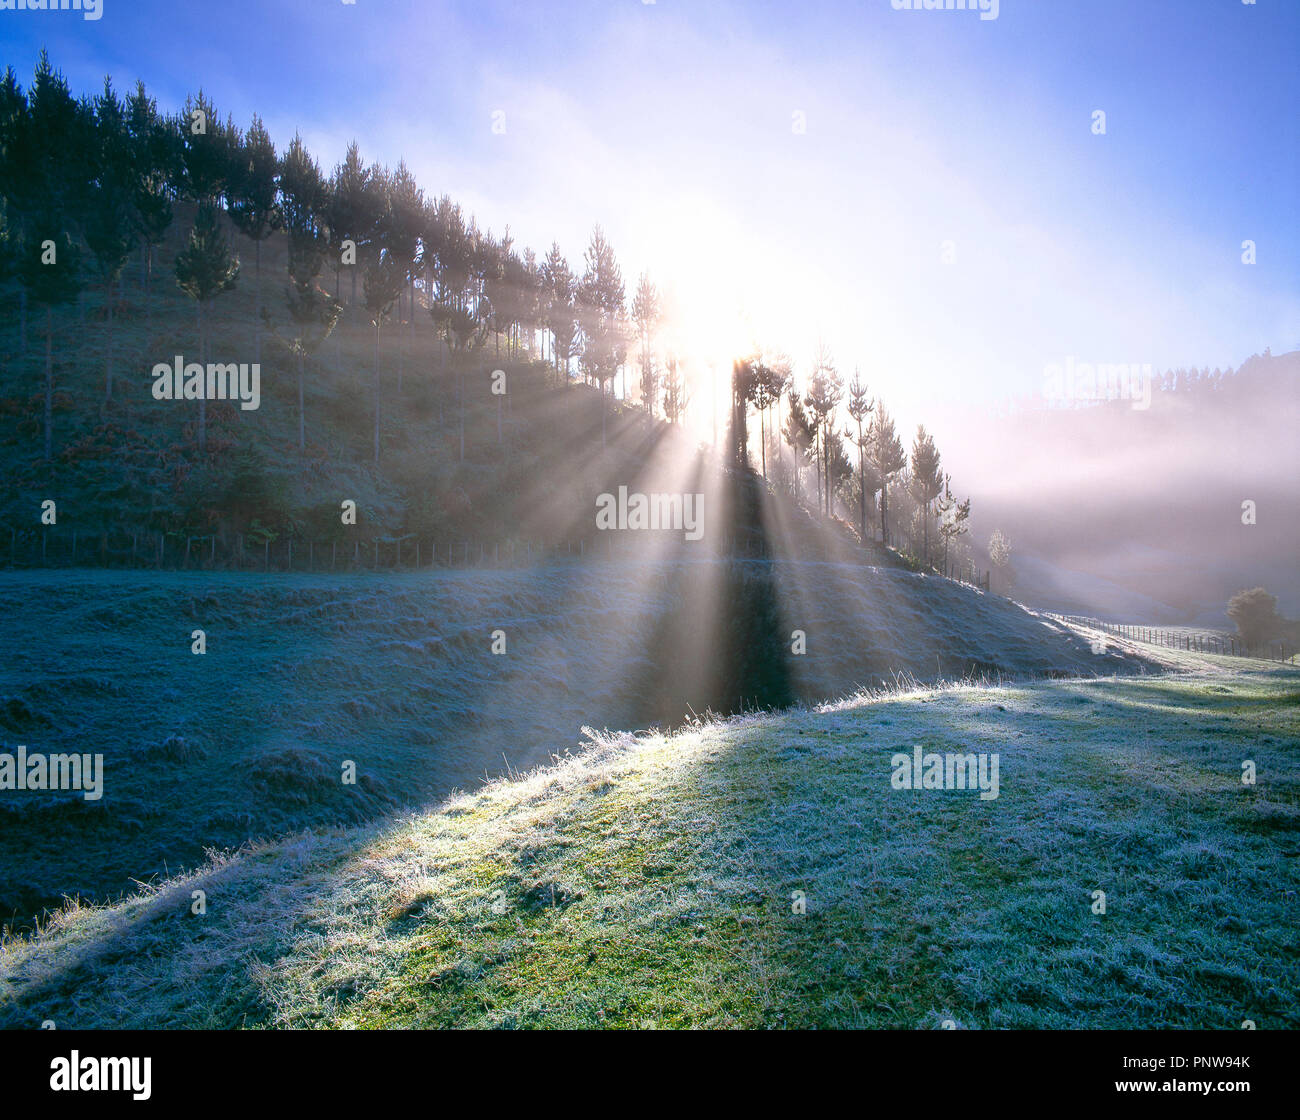 New Zealand. North Island. Hunua. Wintery landscape. Sunrays through trees. - Stock Image